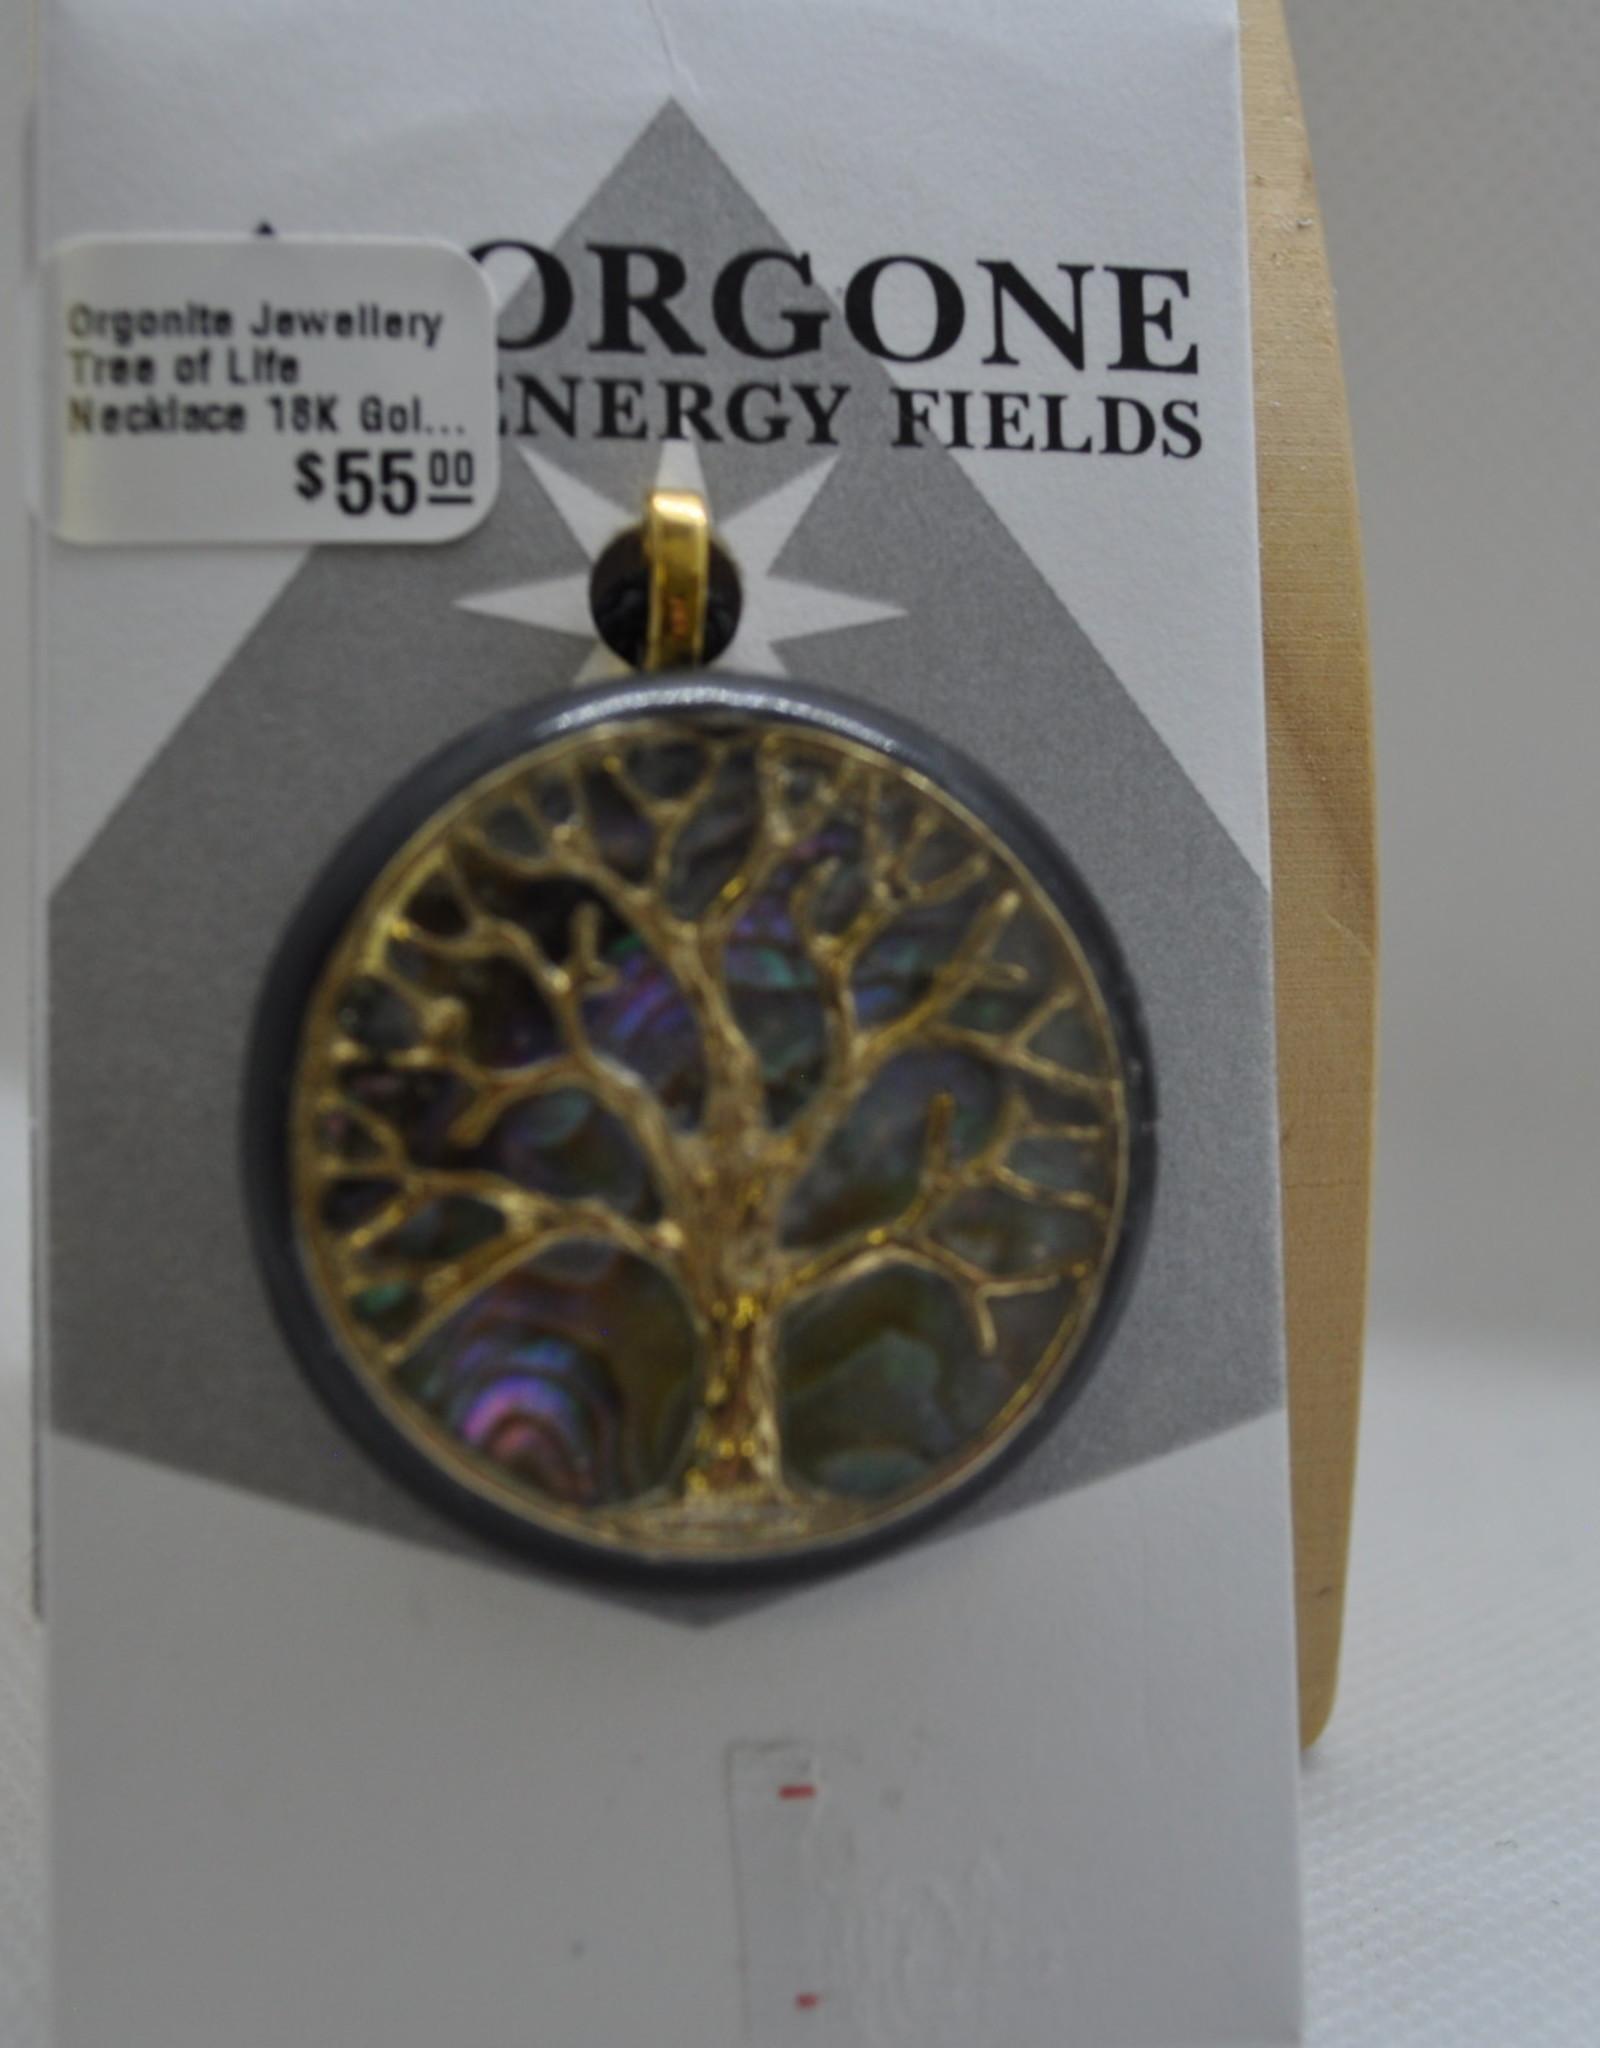 Orgone Energy Fields Tree of Life 18K Gold